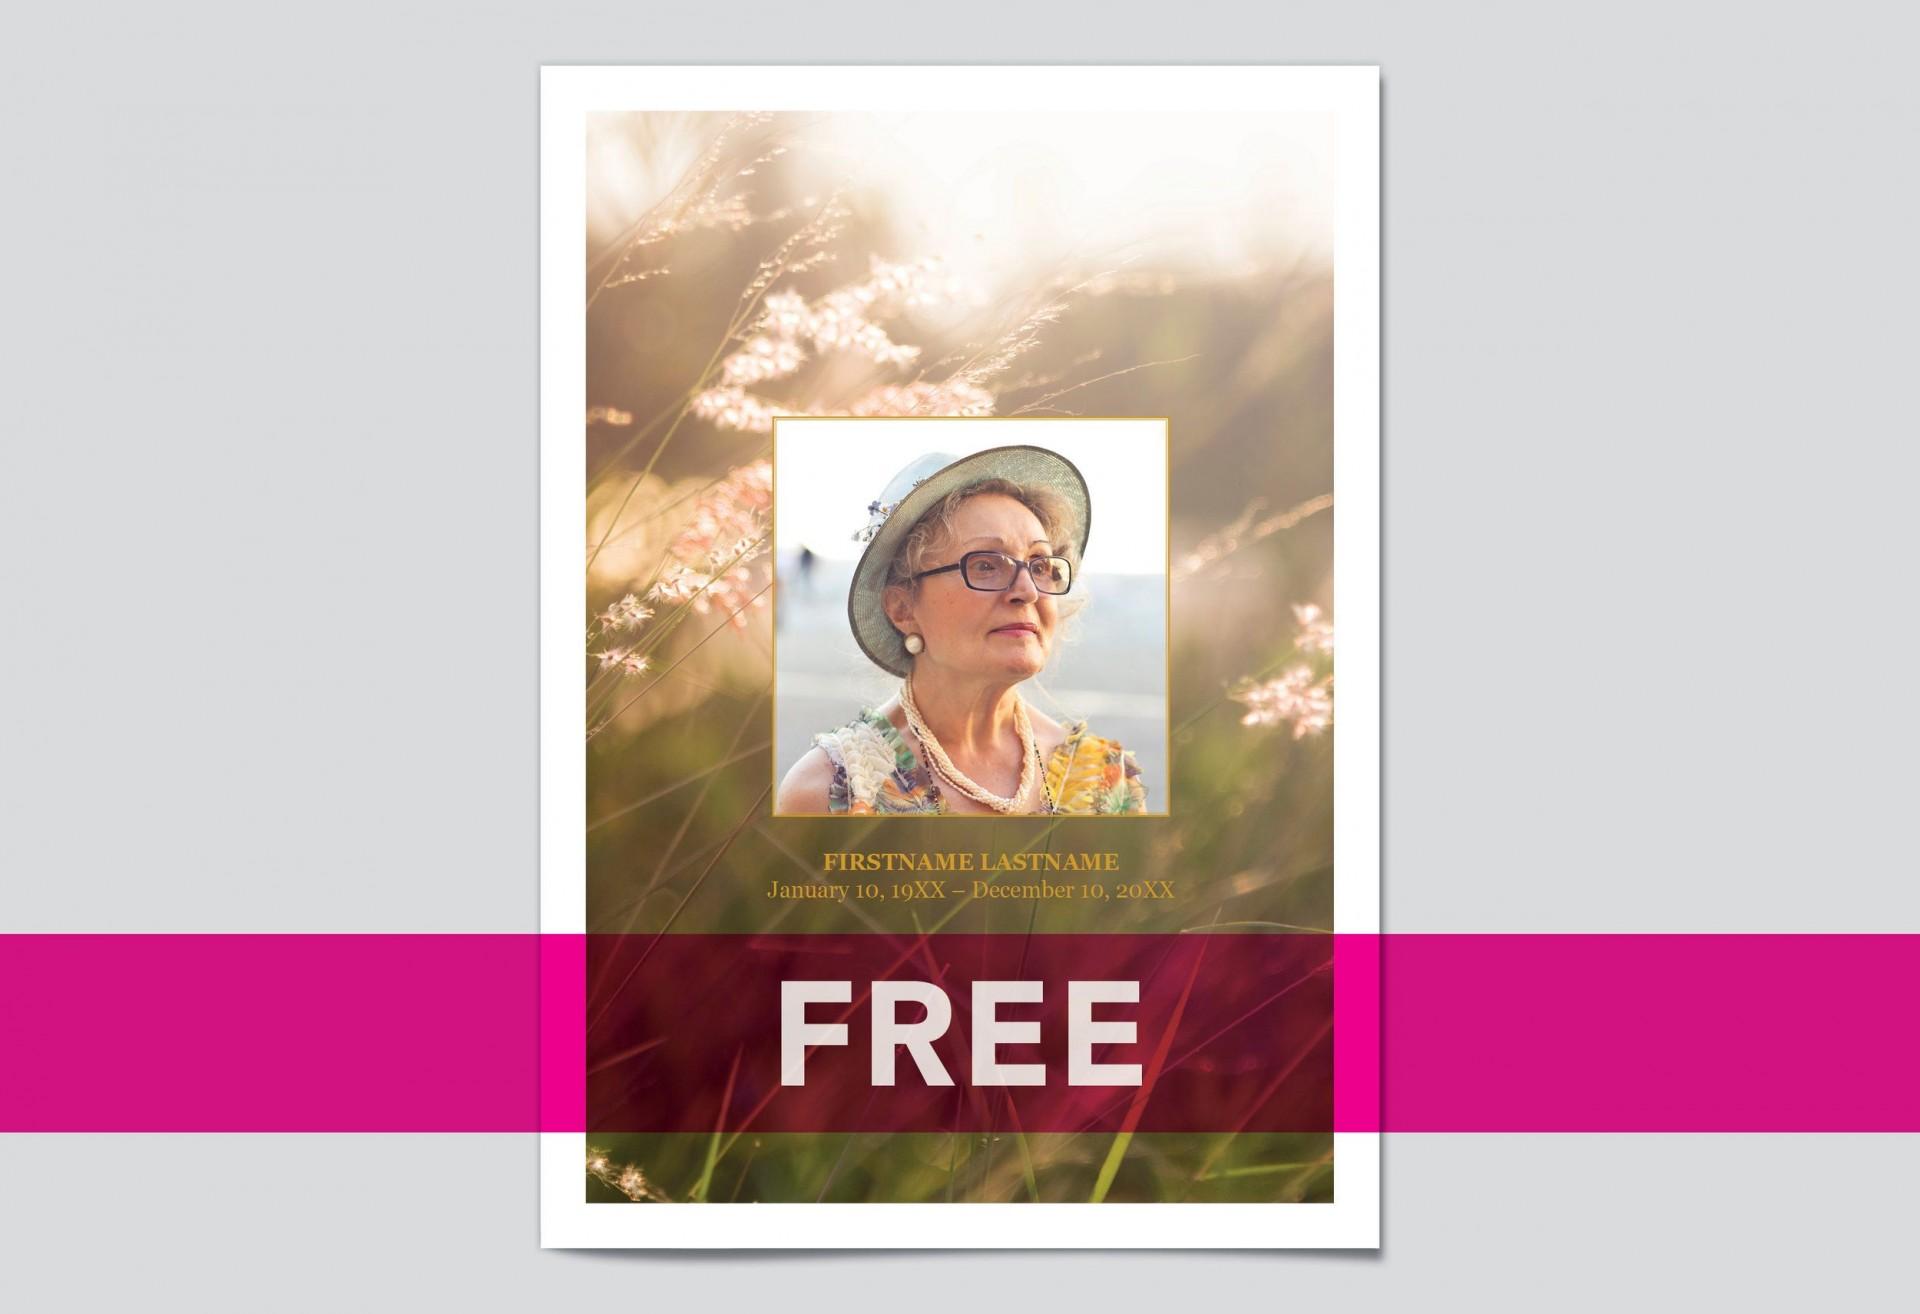 008 Wonderful Free Celebration Of Life Program Template Download Concept 1920